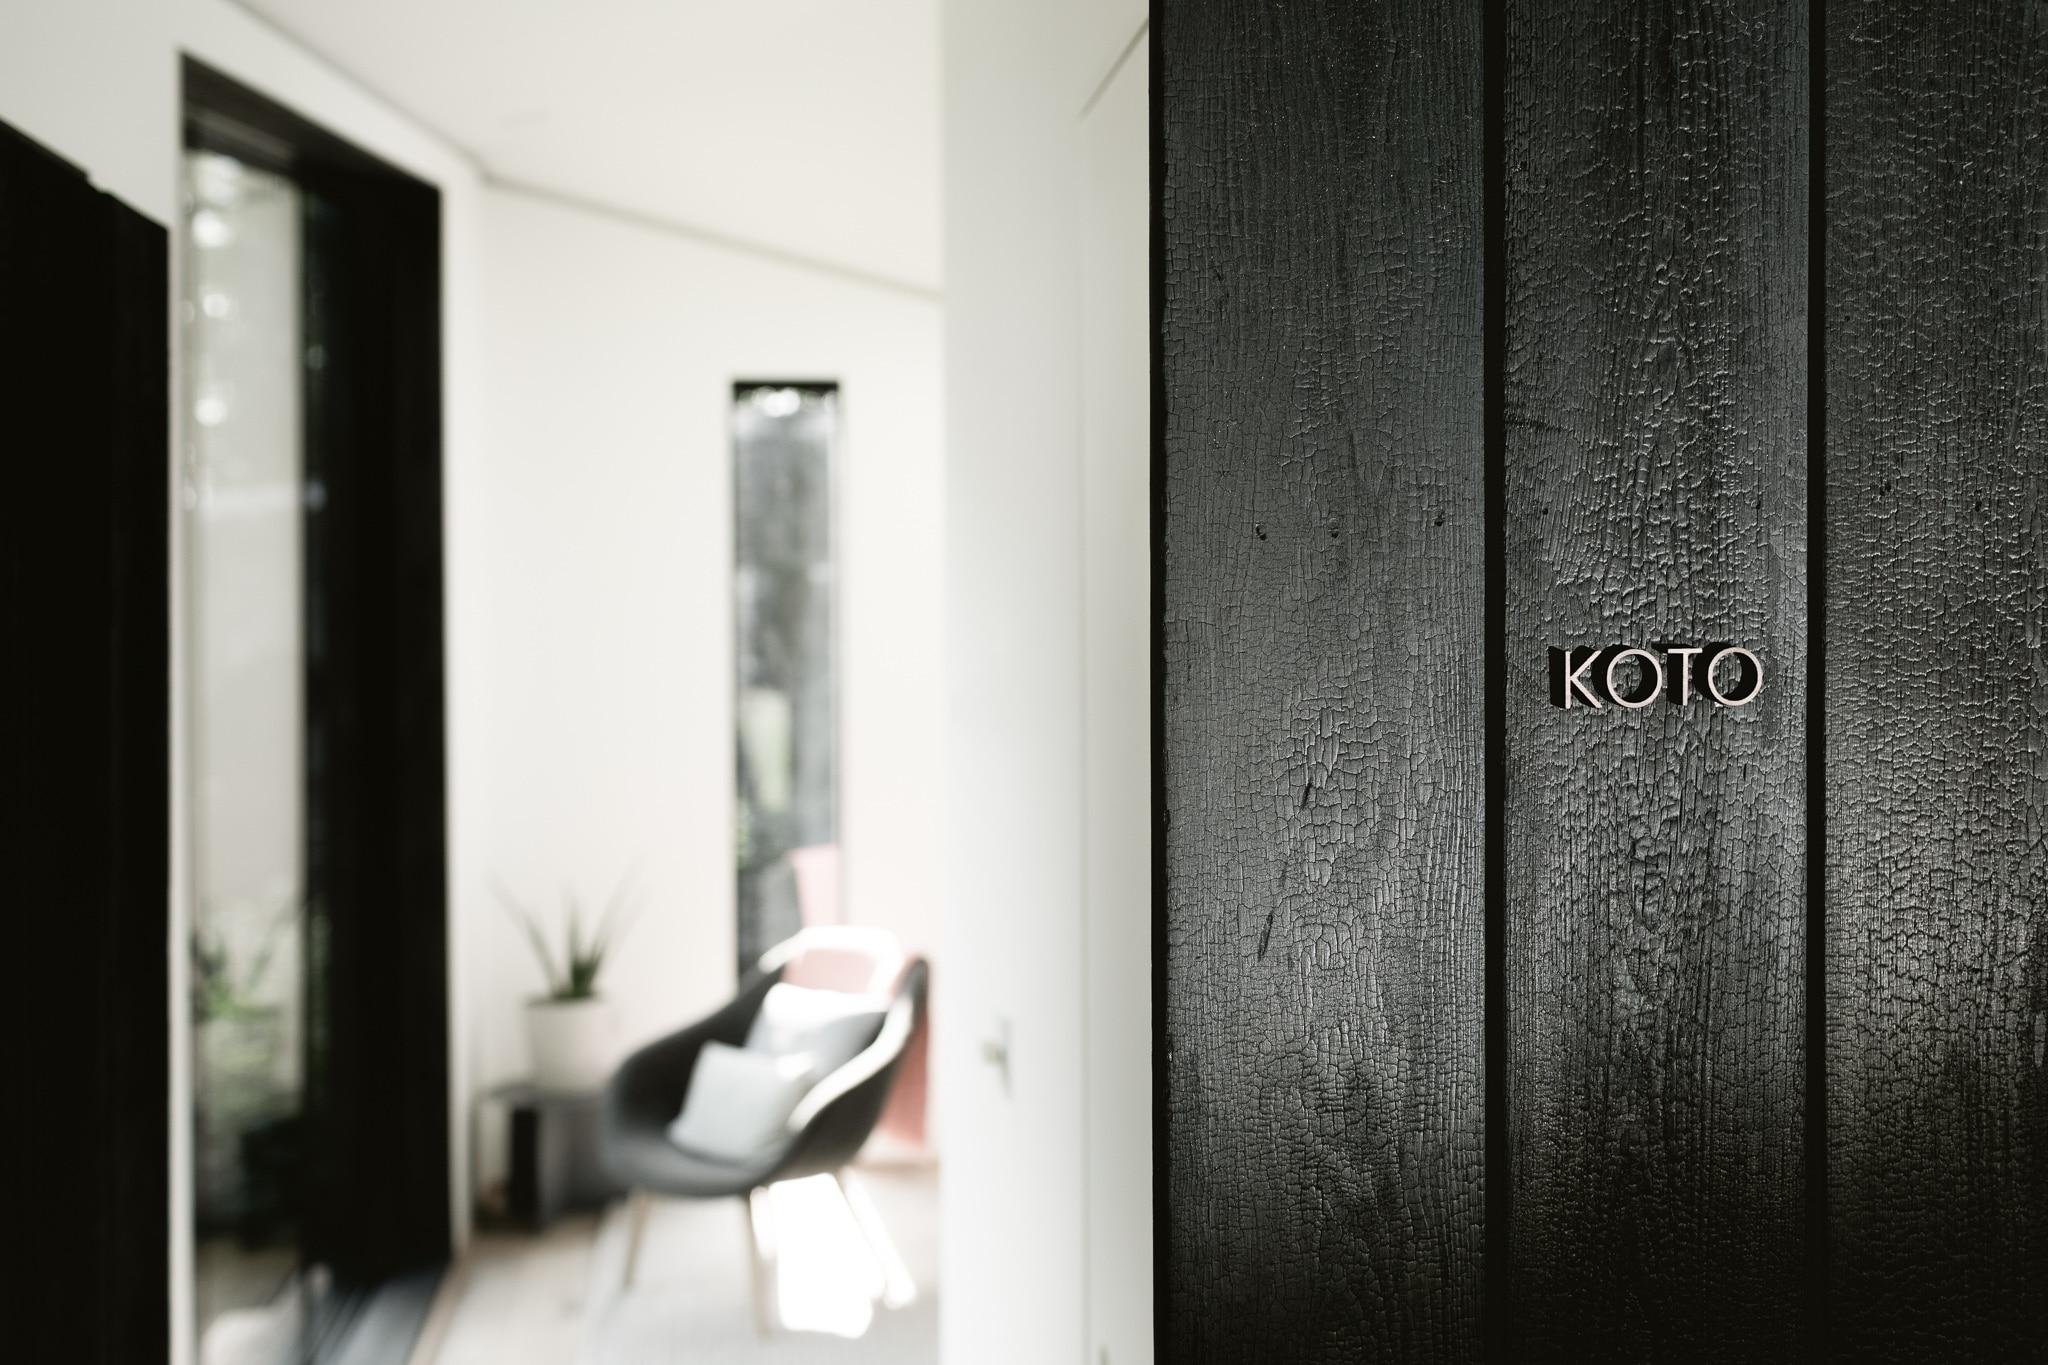 Koto Cabin uses Shou Sugi Ban